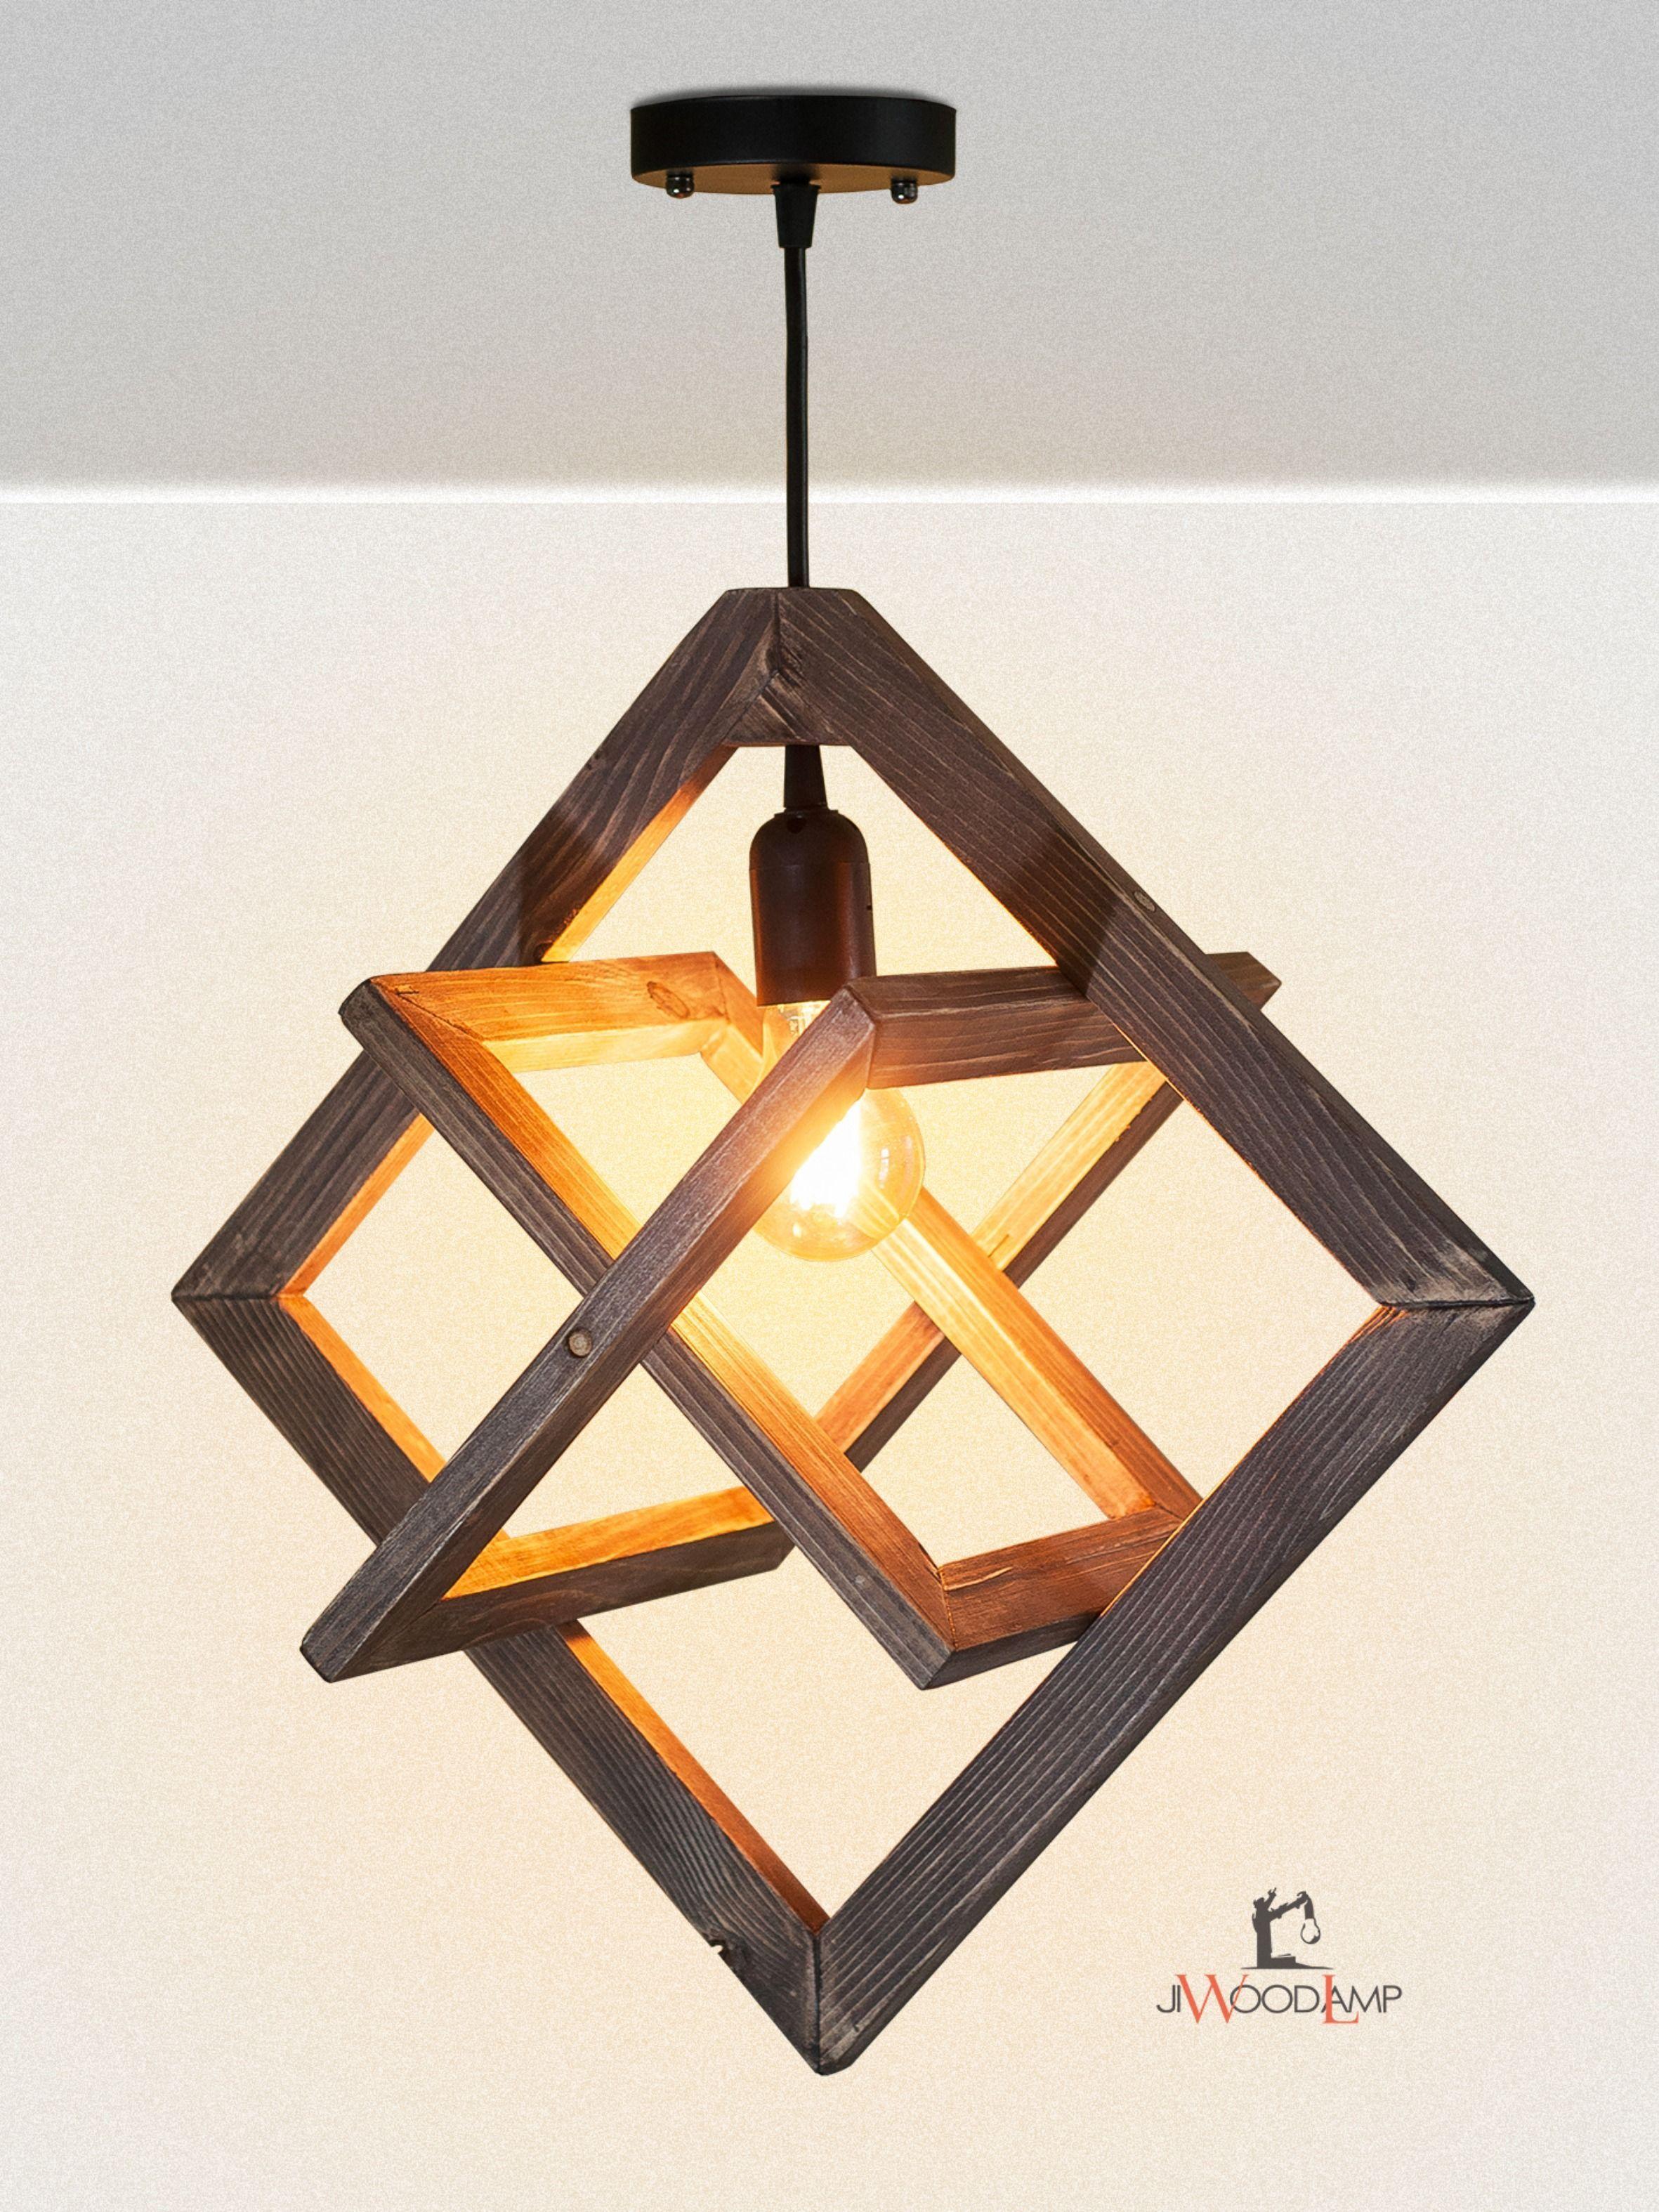 Hangelampe Aus Holz Holzlampe Aus Beleuchtung Hangelampe Holz Holzlampe In 2020 Holz Hangelampe Lampen Aus Holz Rustikale Beleuchtung